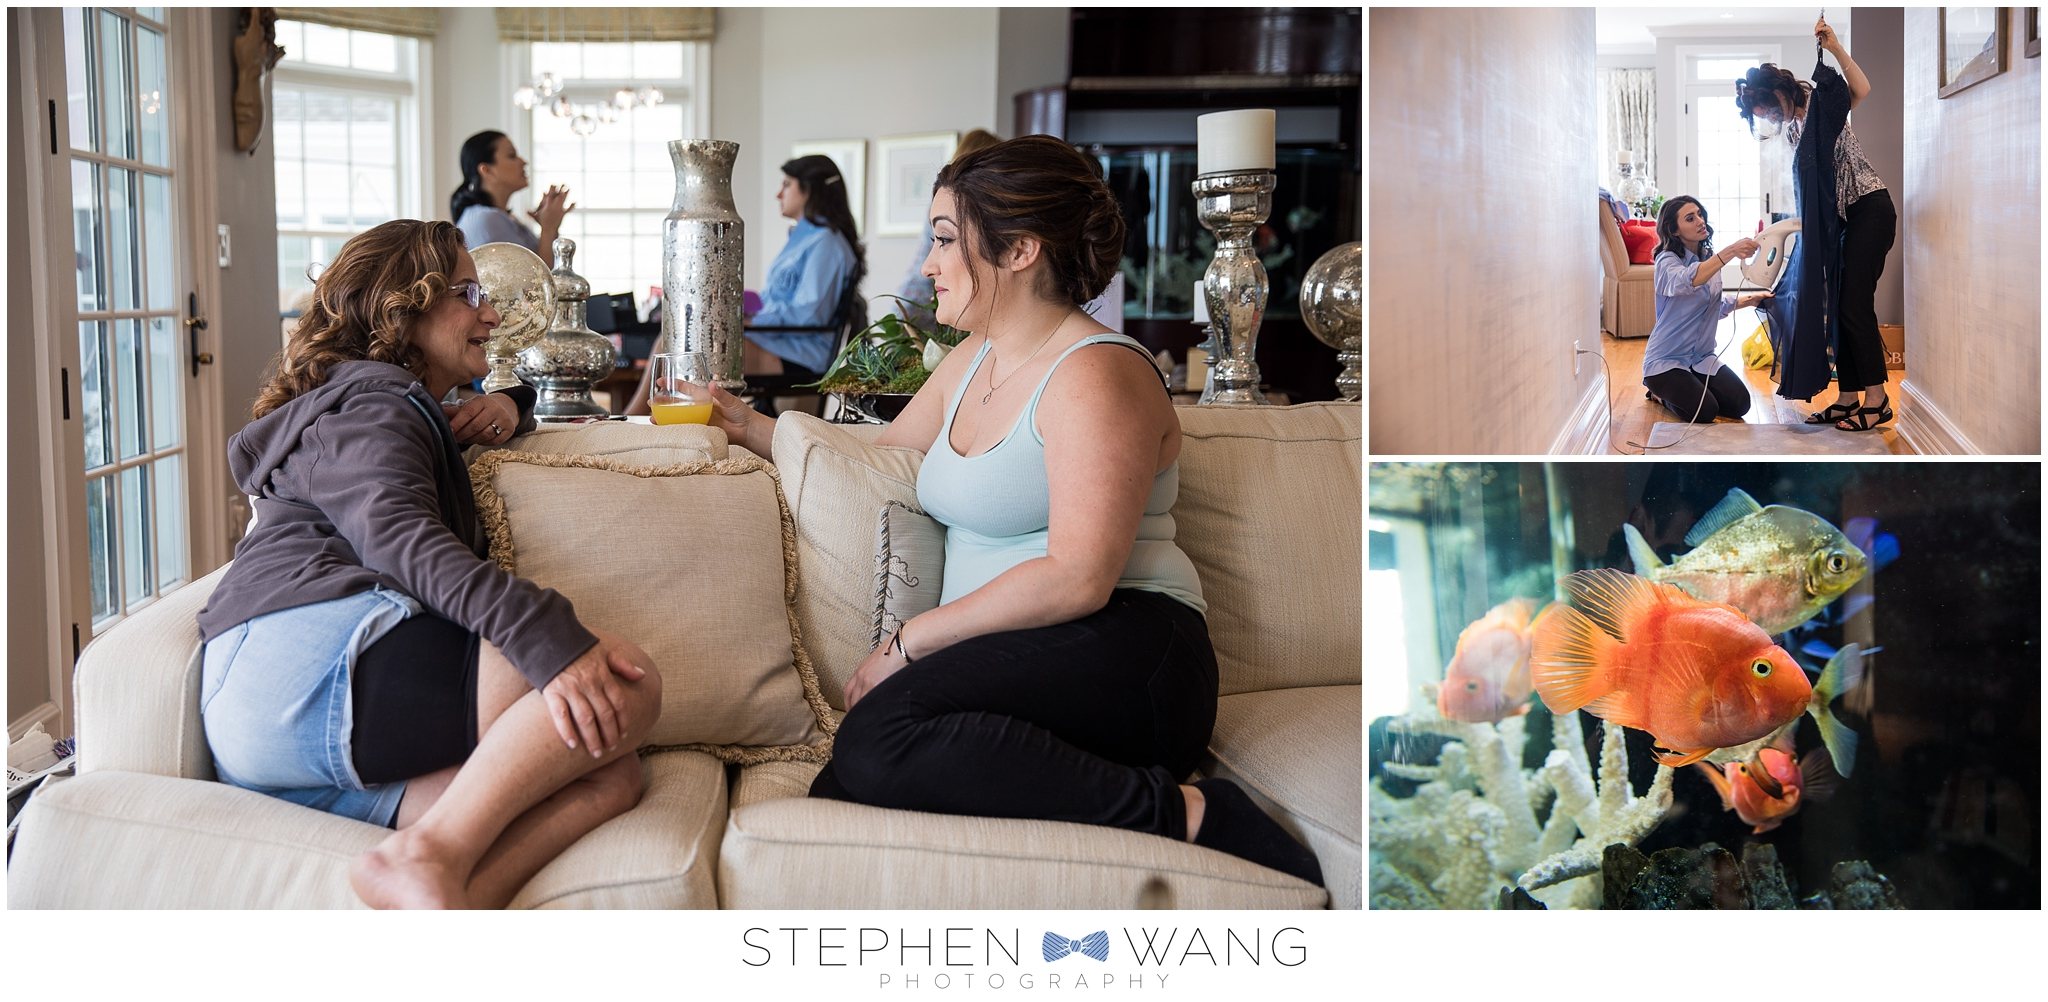 Stephen Wang Photography Shorehaven Norwalk CT Wedding Photographer connecticut shoreline shore haven - 4.jpg